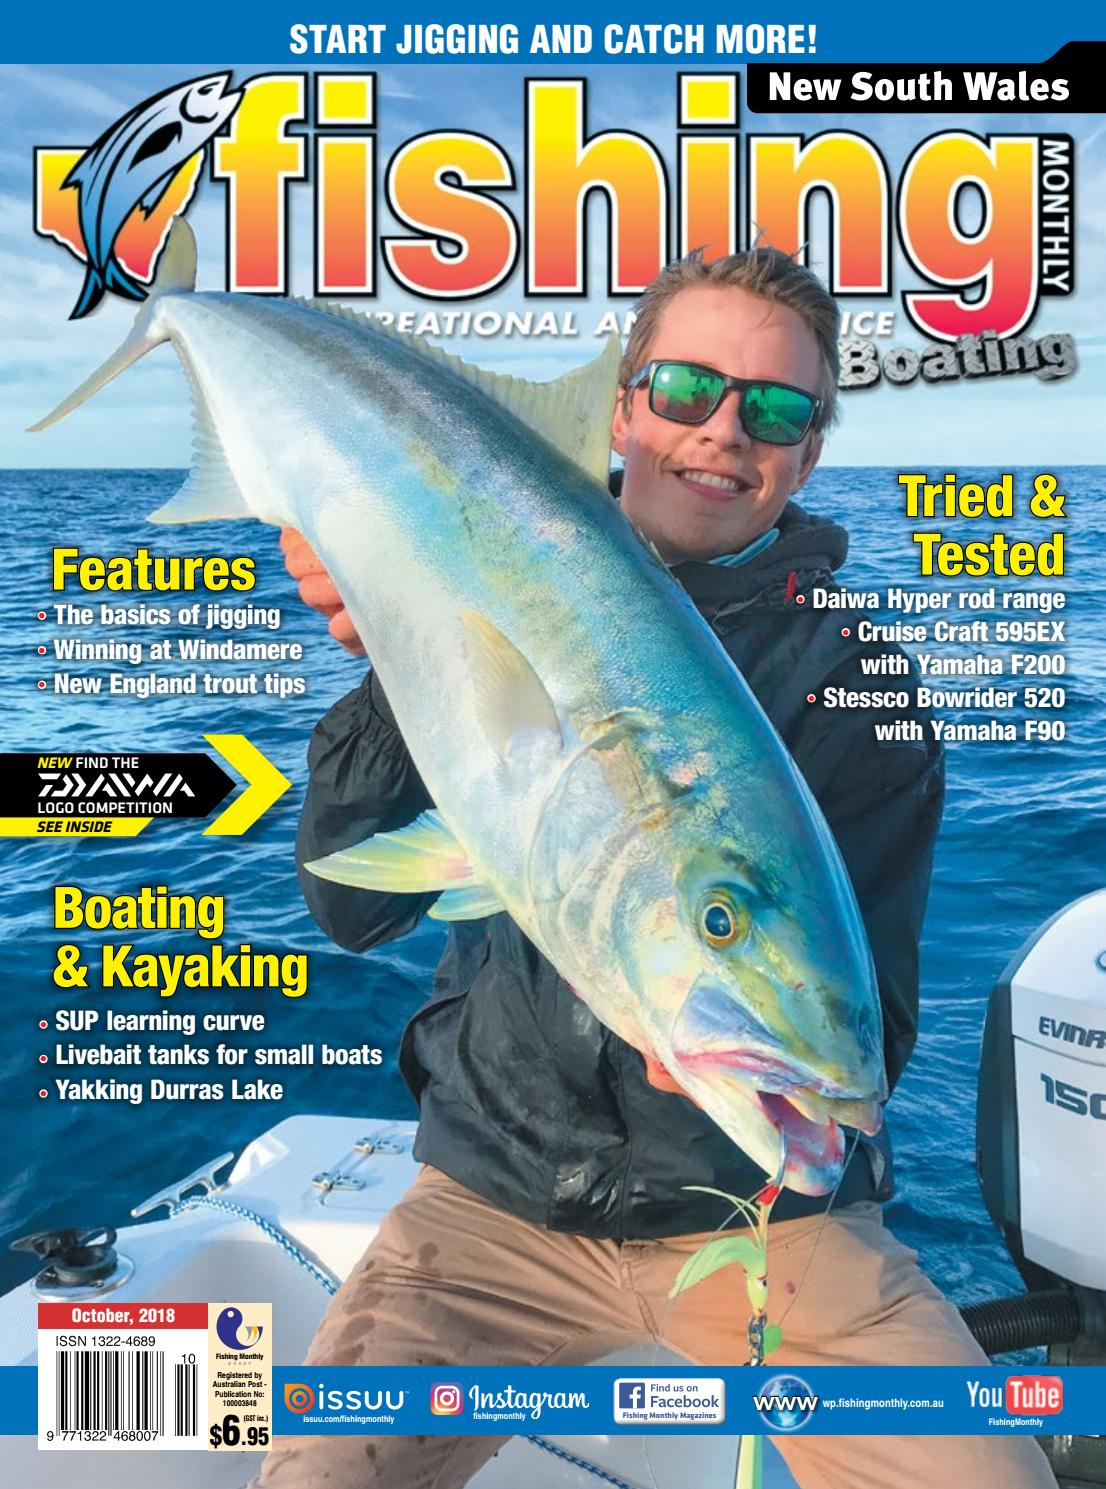 2x Green Tungsten Bullet Flipping Weight Fishing Sinker Lure Fish Accessories FG